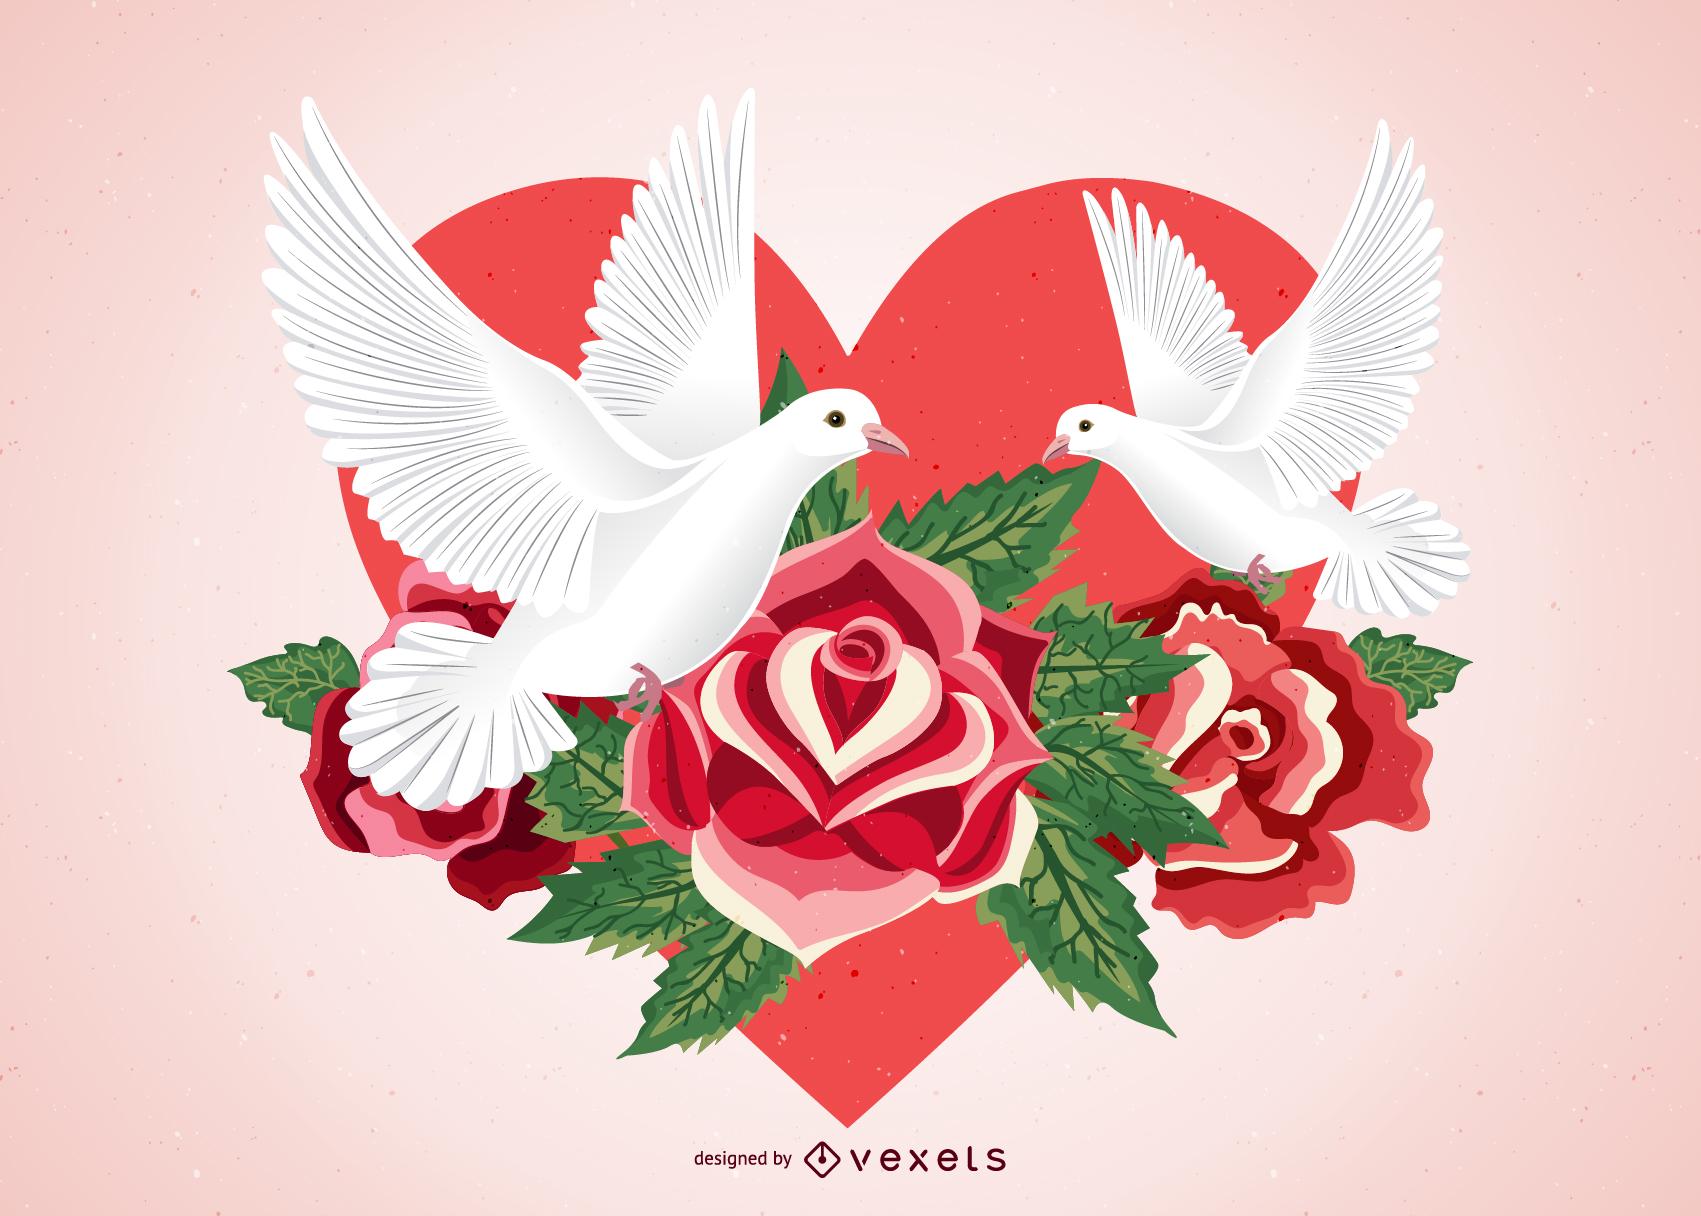 Rosen und Tauben Vektor-Illustration